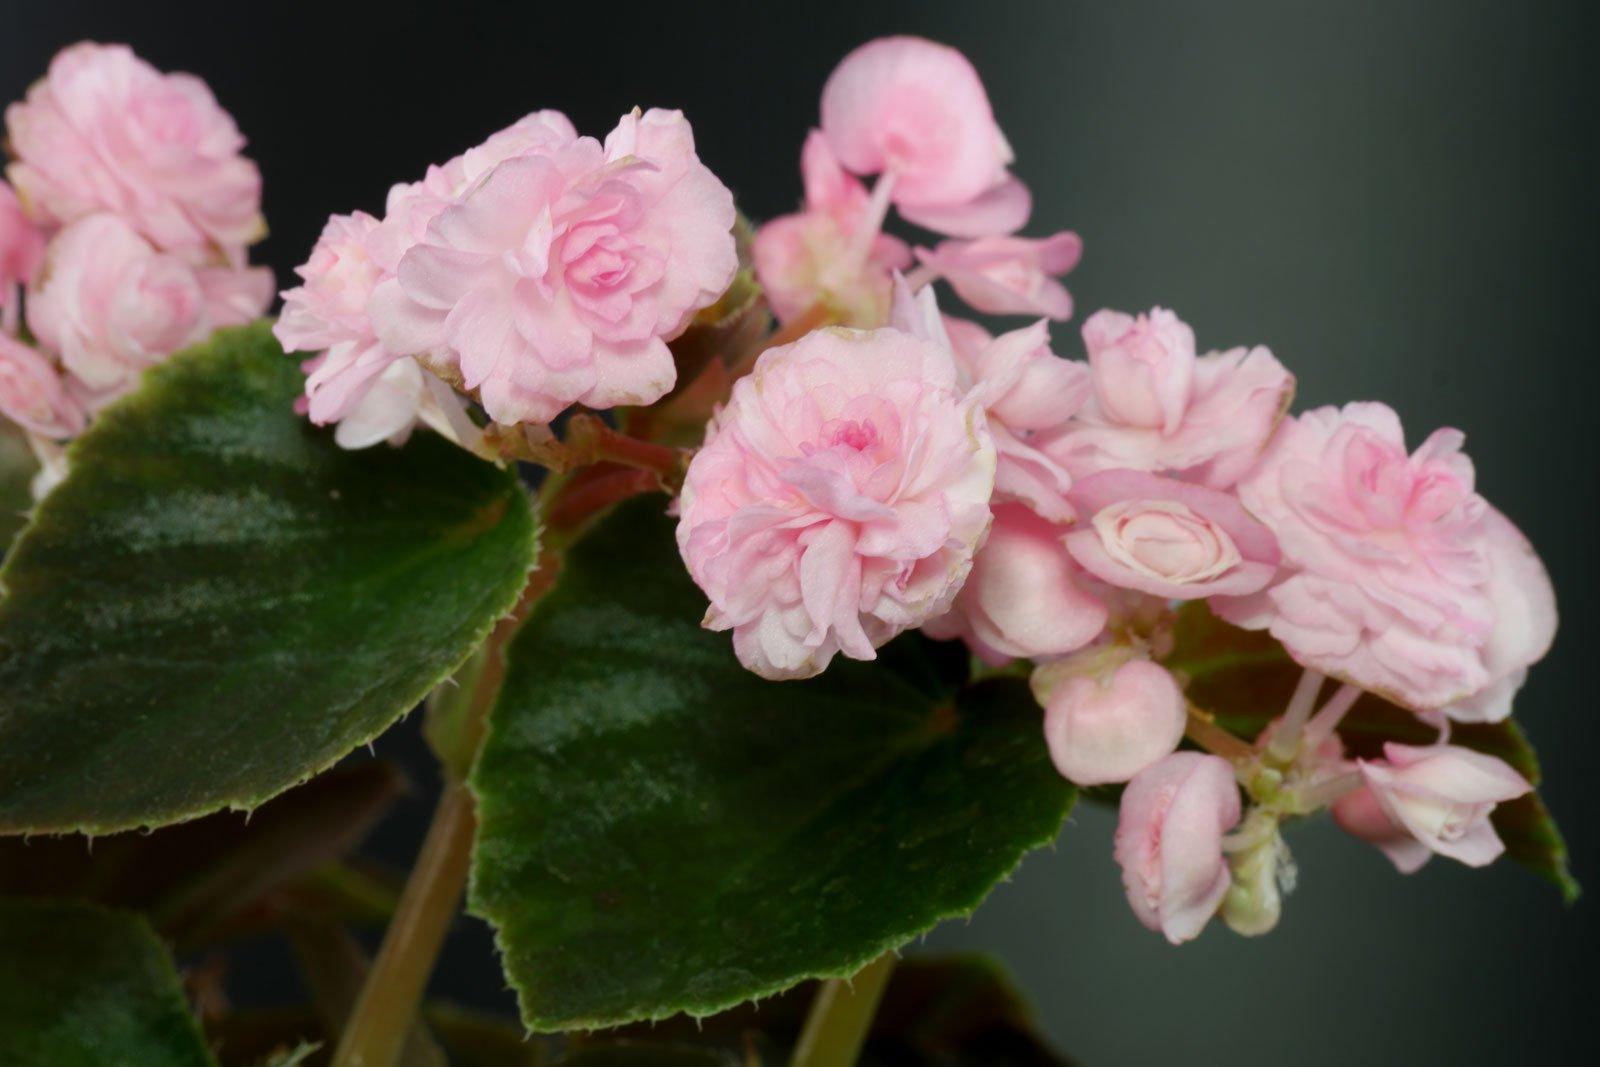 Begonia × semperflorens Doublet Pink